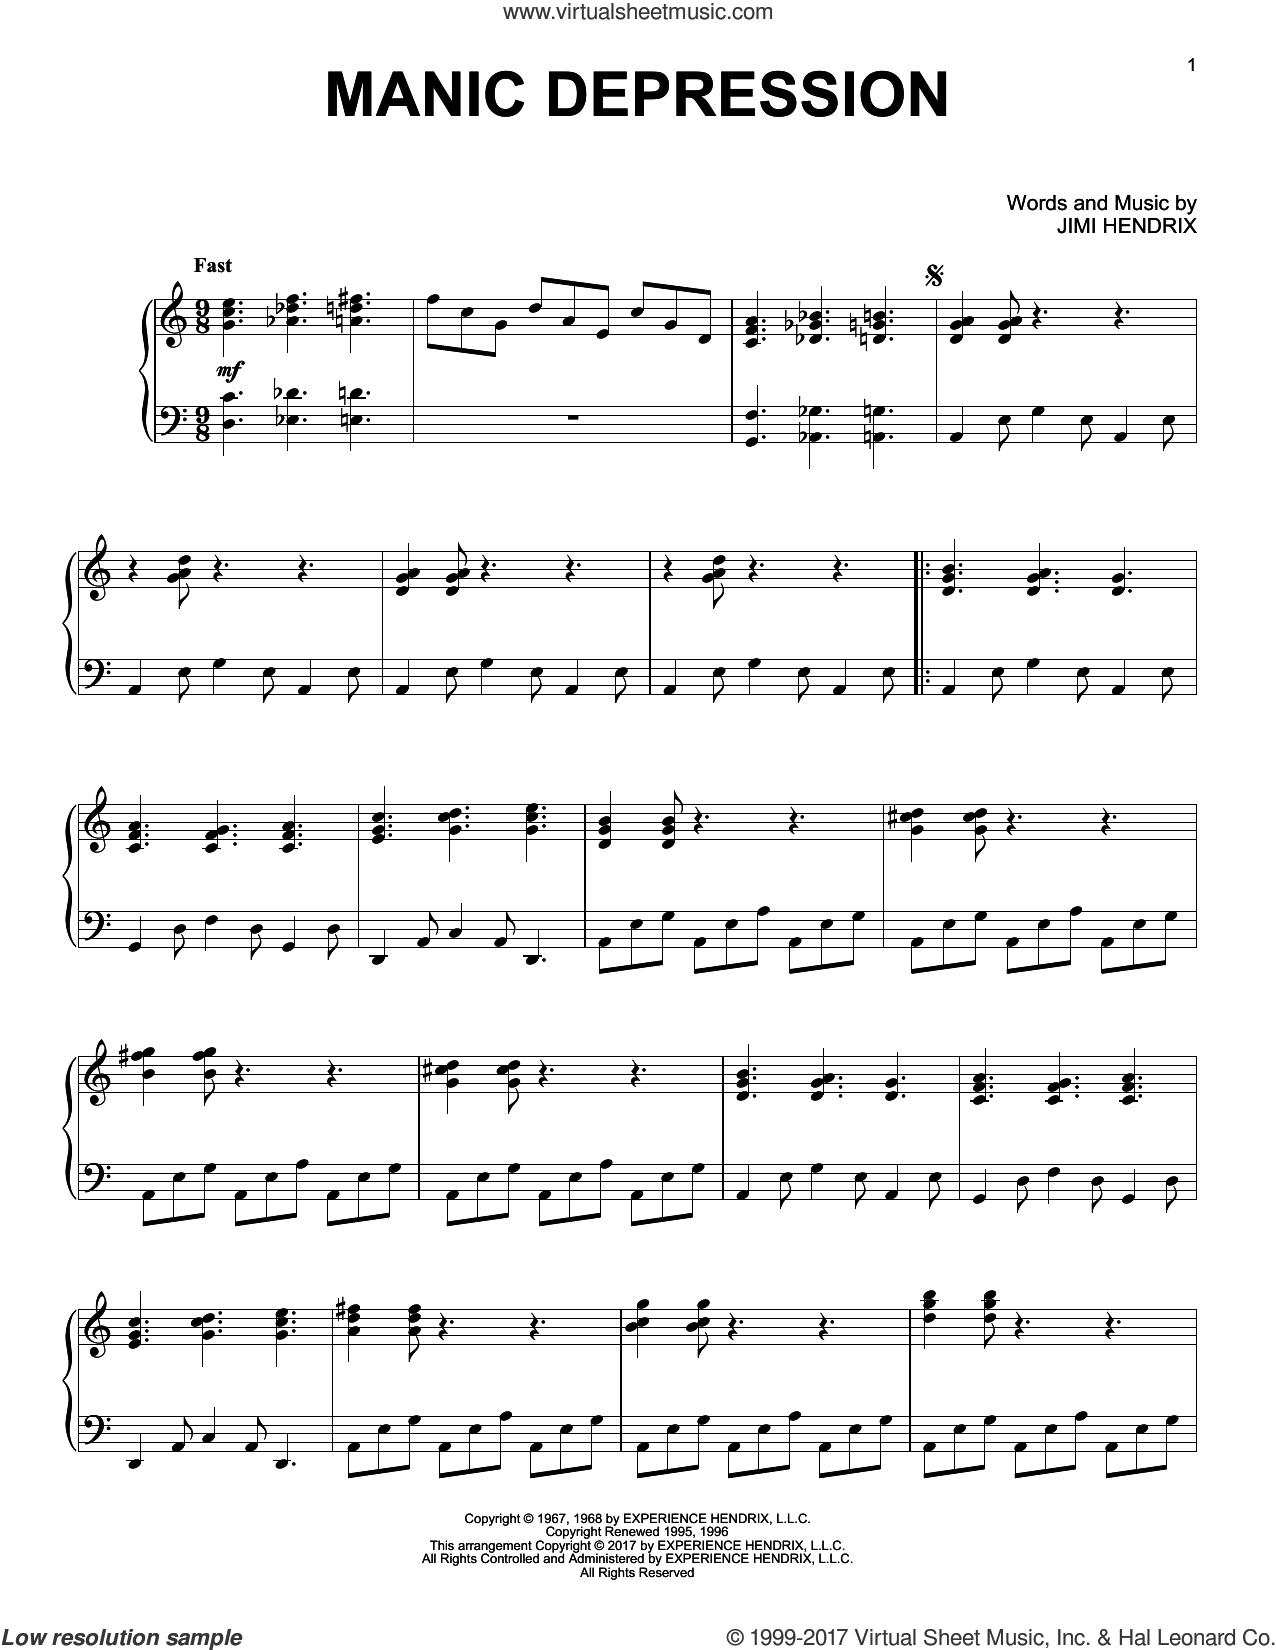 Manic Depression [Jazz version] sheet music for piano solo by Jimi Hendrix, intermediate skill level